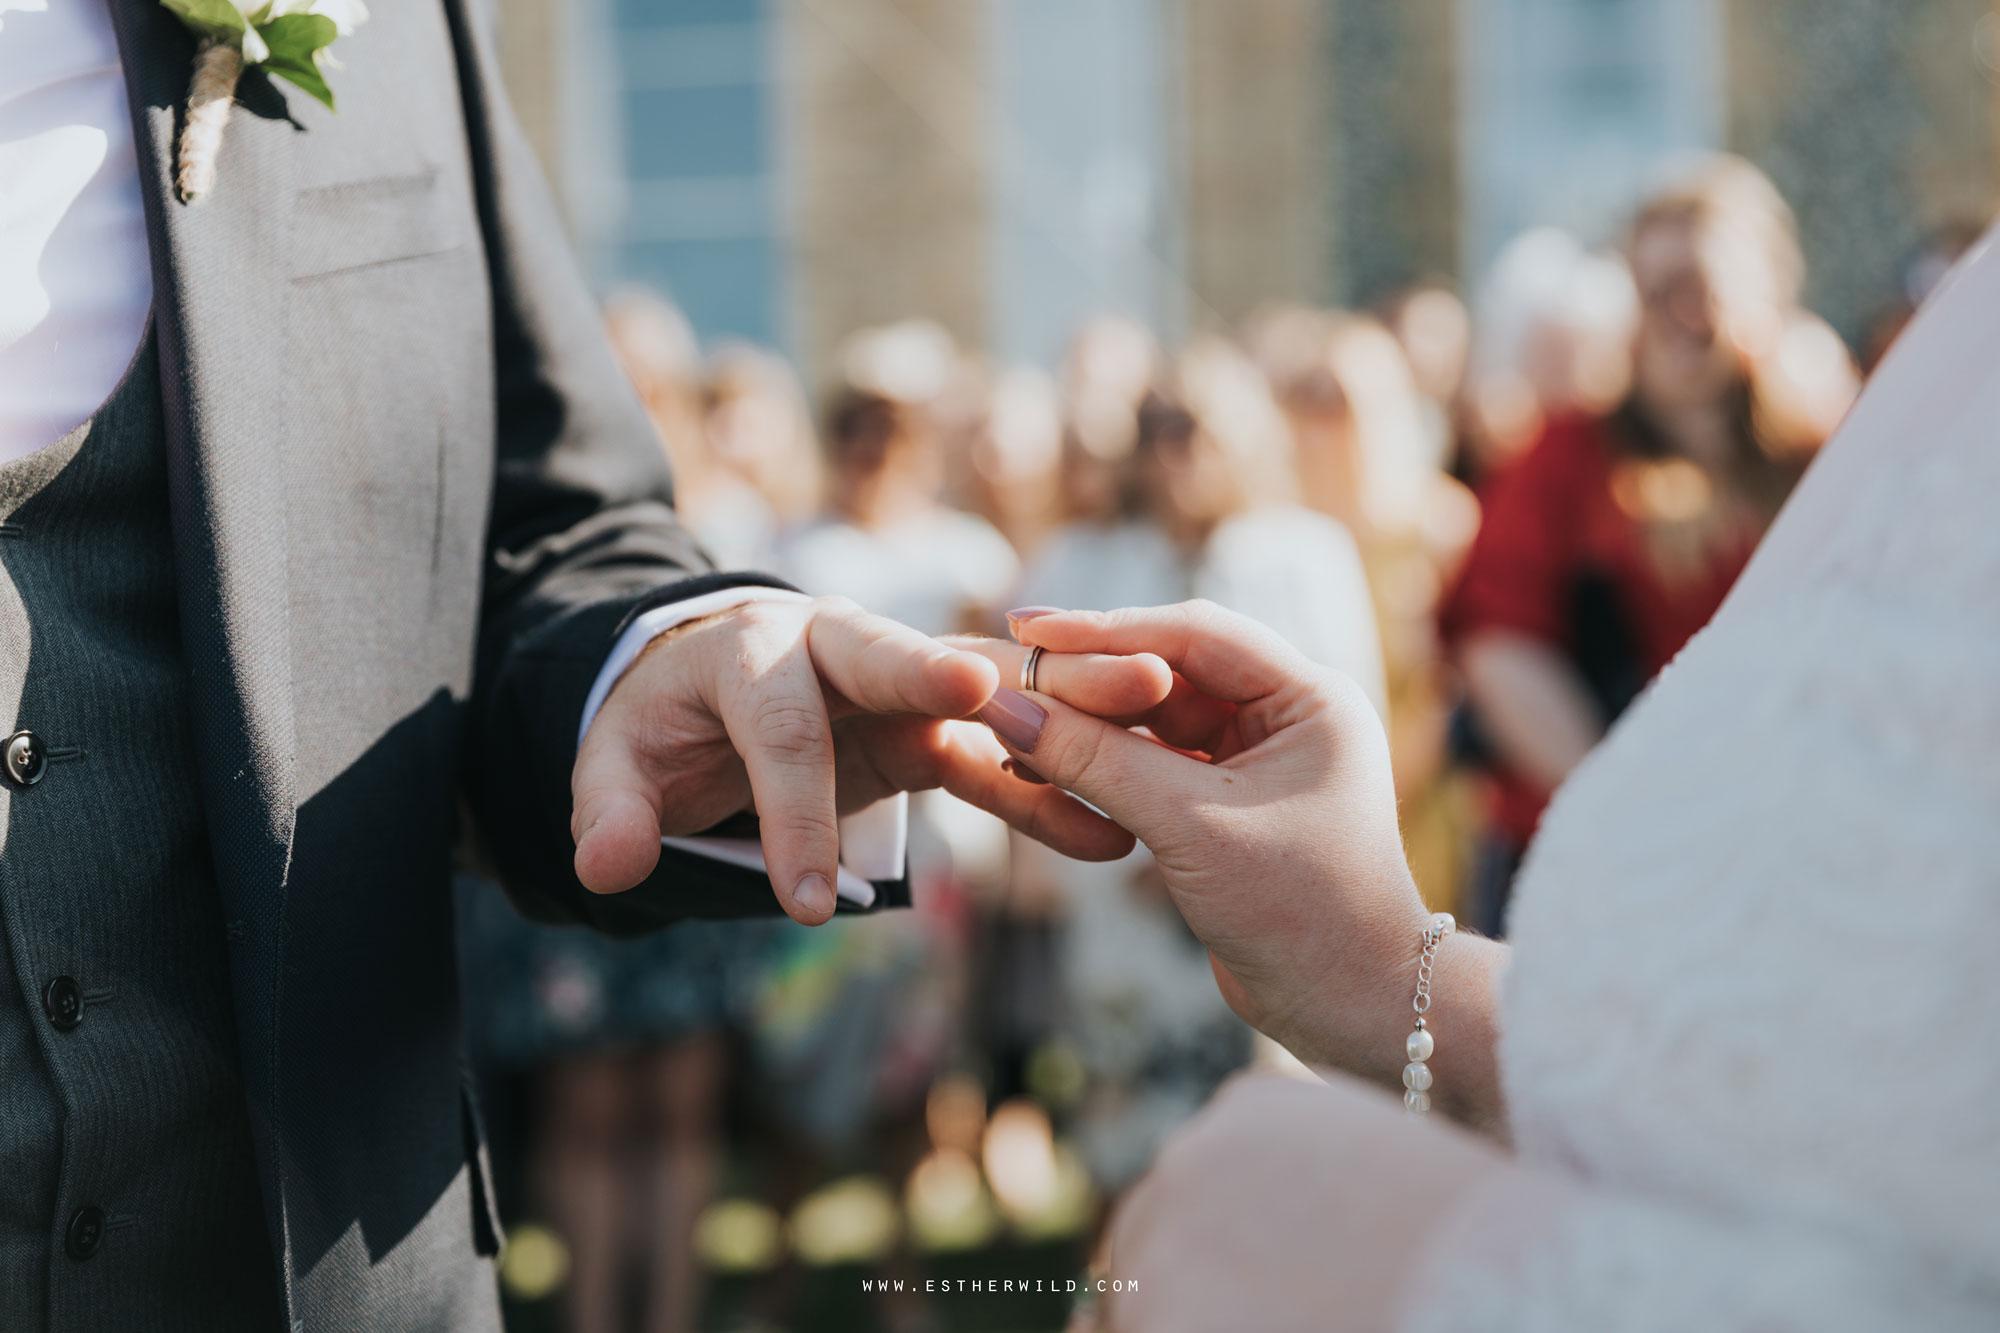 Cromer_Wedding_Beach_Outdoor_Ceremony_Norfolk_North_Lodge_Registry_Office_Rocket_House_Cafe_Cromer_Pier_IMG_3823.jpg